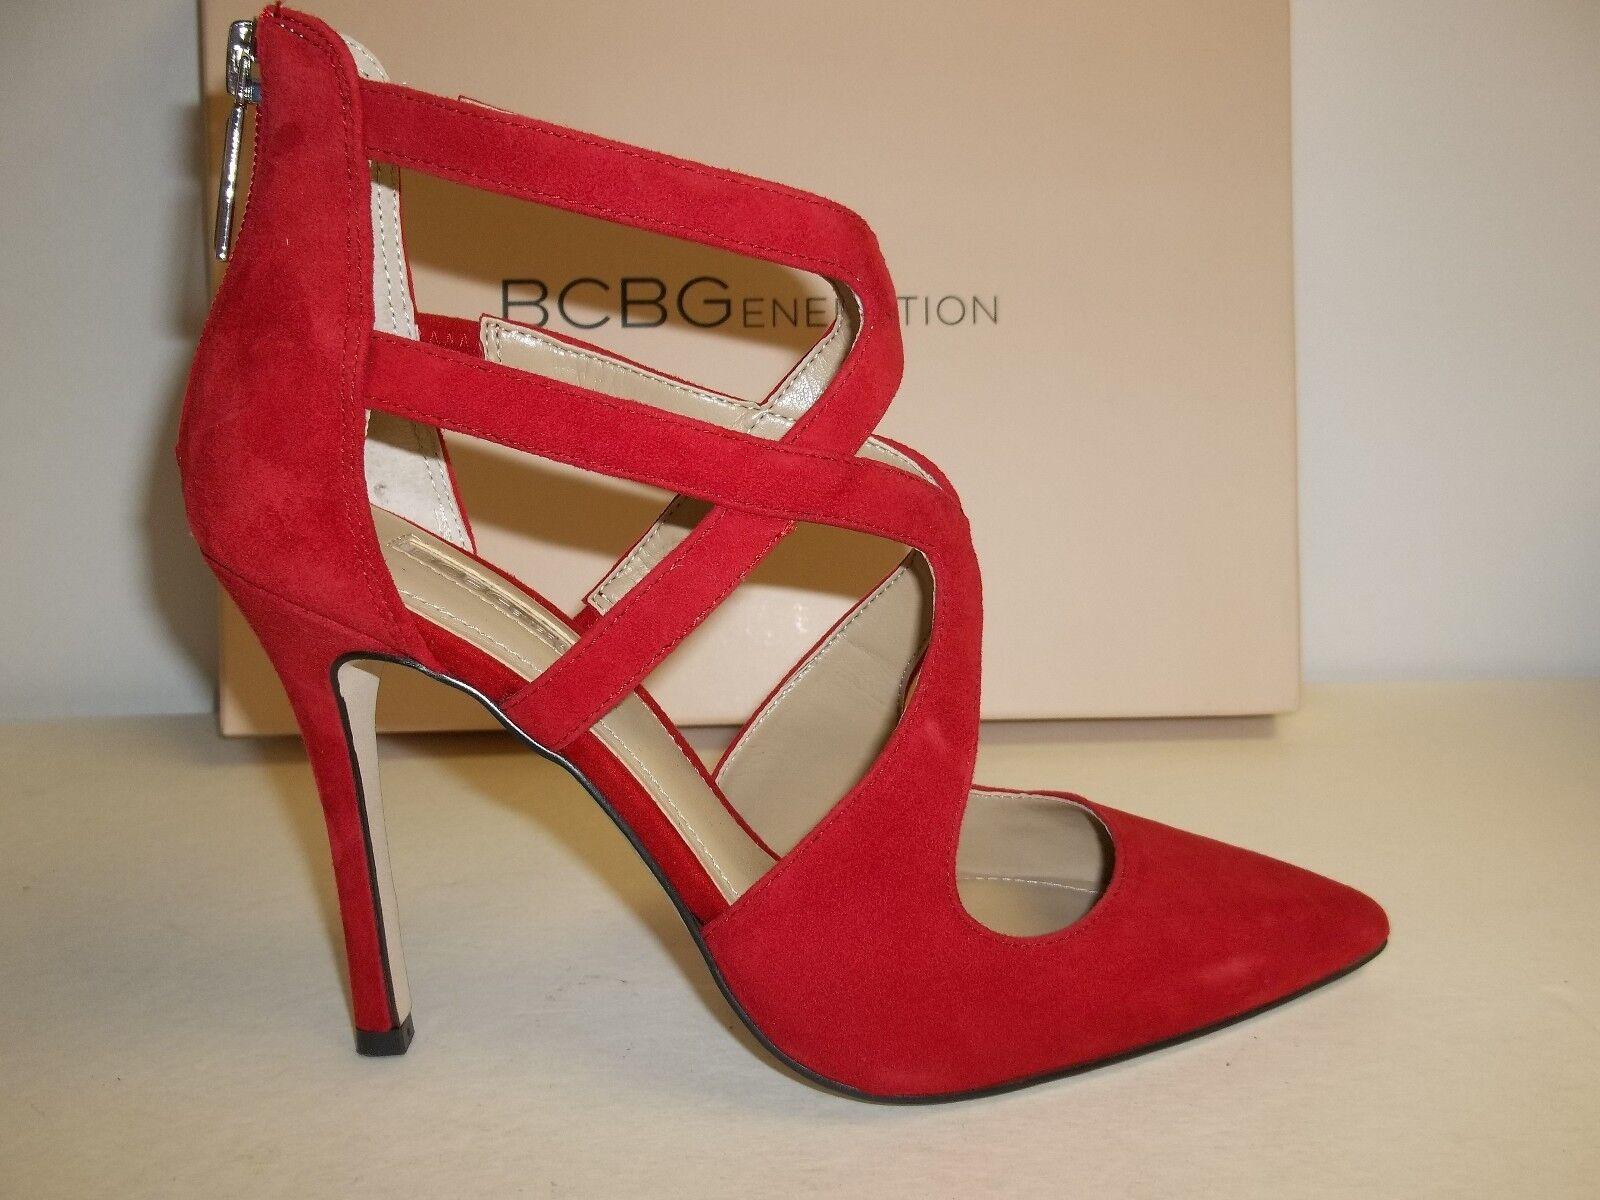 BCBG BCBGeneration Size 5.5 M Torpido Red Suede Pumps Donna Heels New Donna Pumps Shoes b3fc46